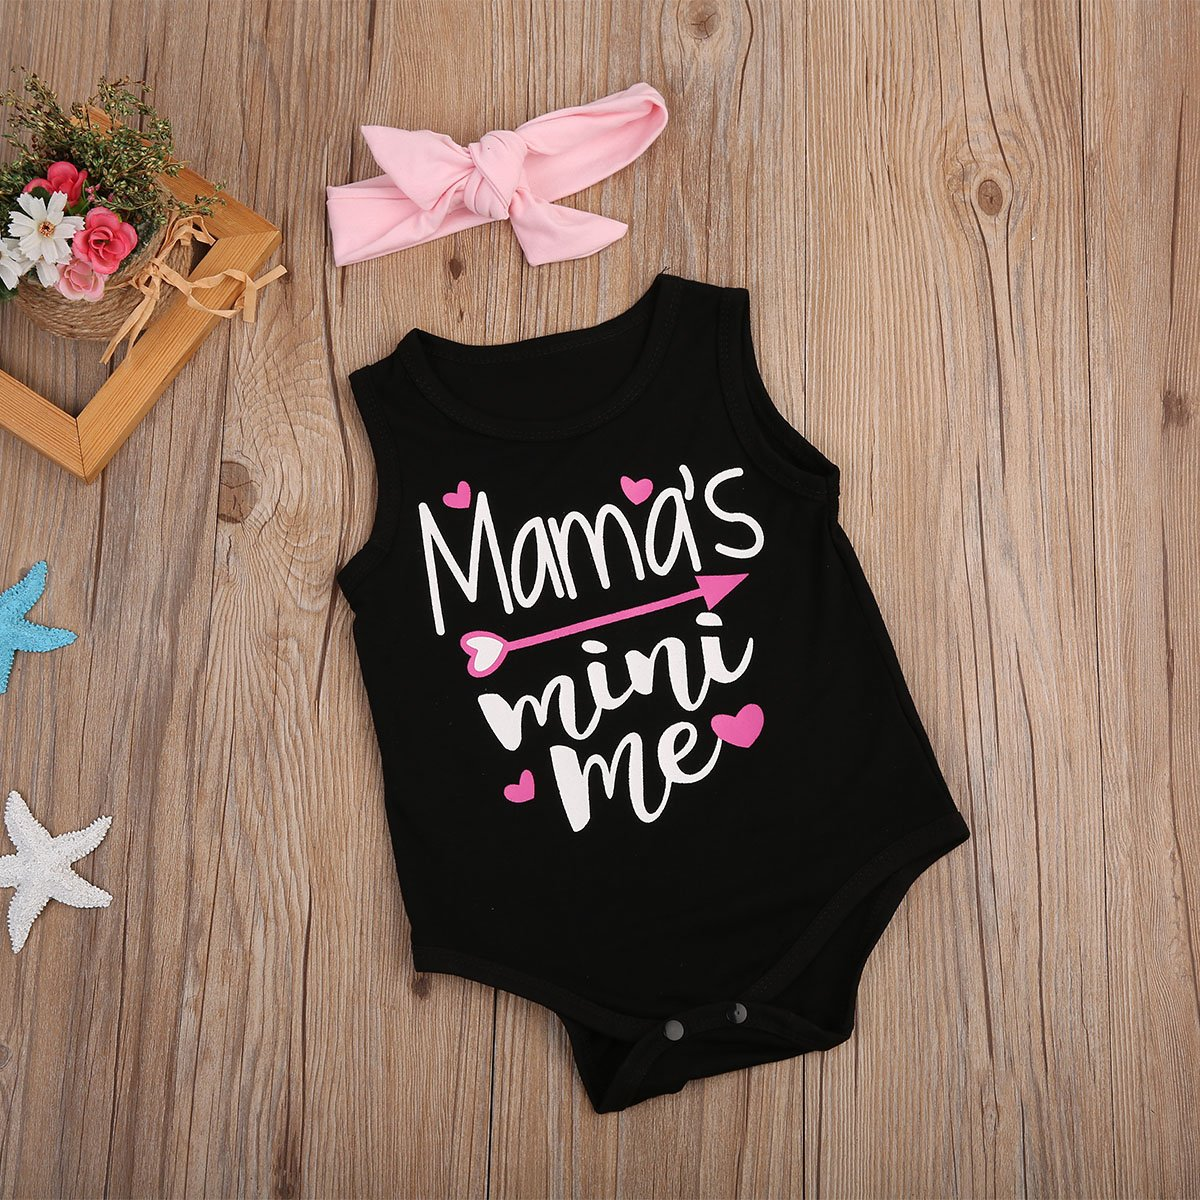 7e4339bb9772 Amazon.com  Maymeimei Newborn Baby Girl Boys Letter Romper ...